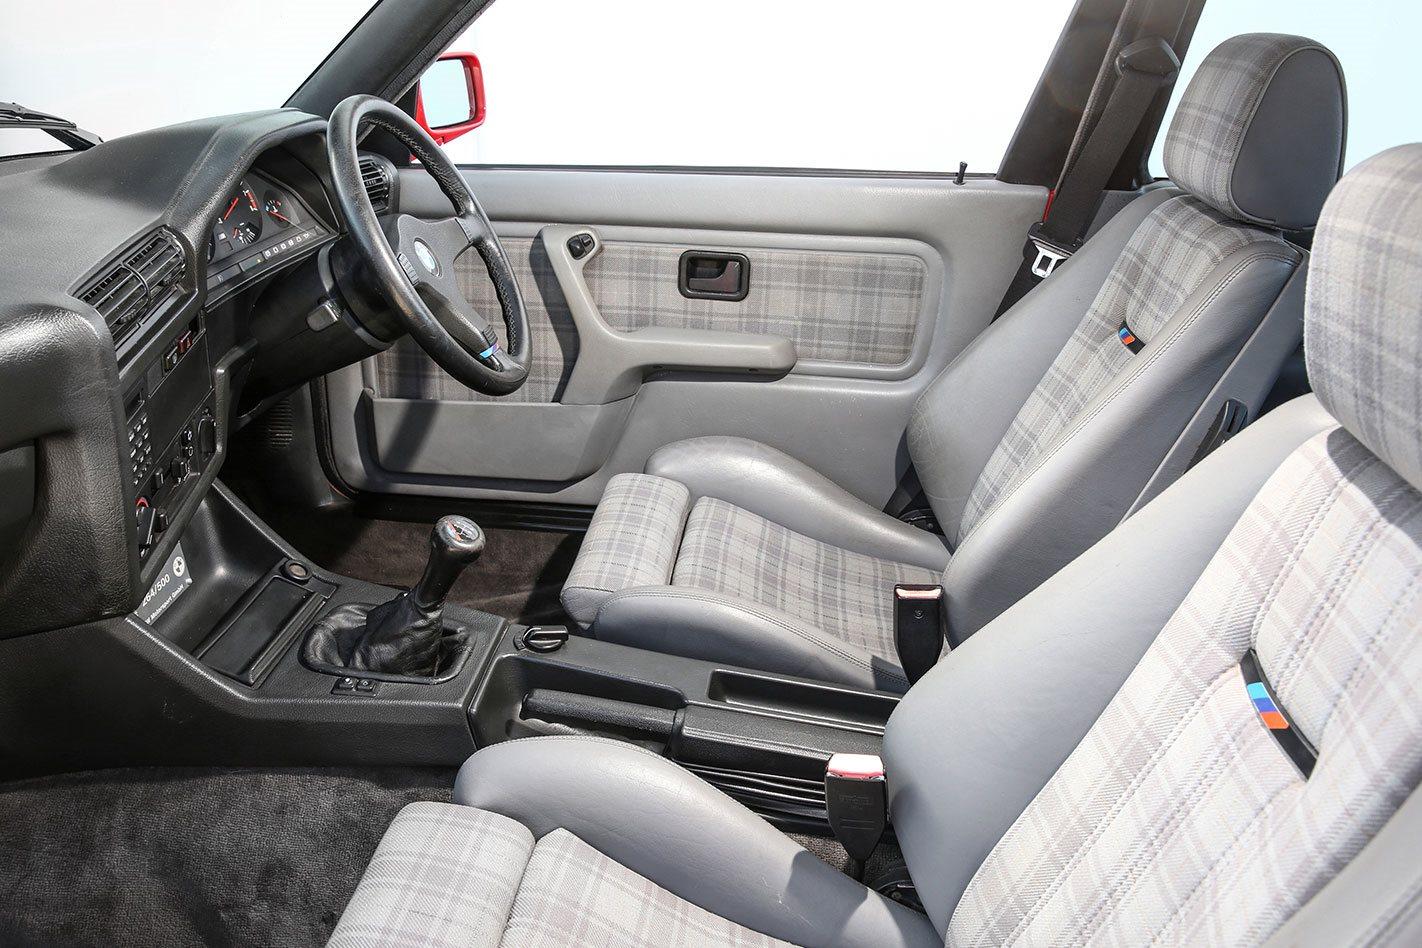 BMW-M3-E30-Evolution-II-interior.jpg